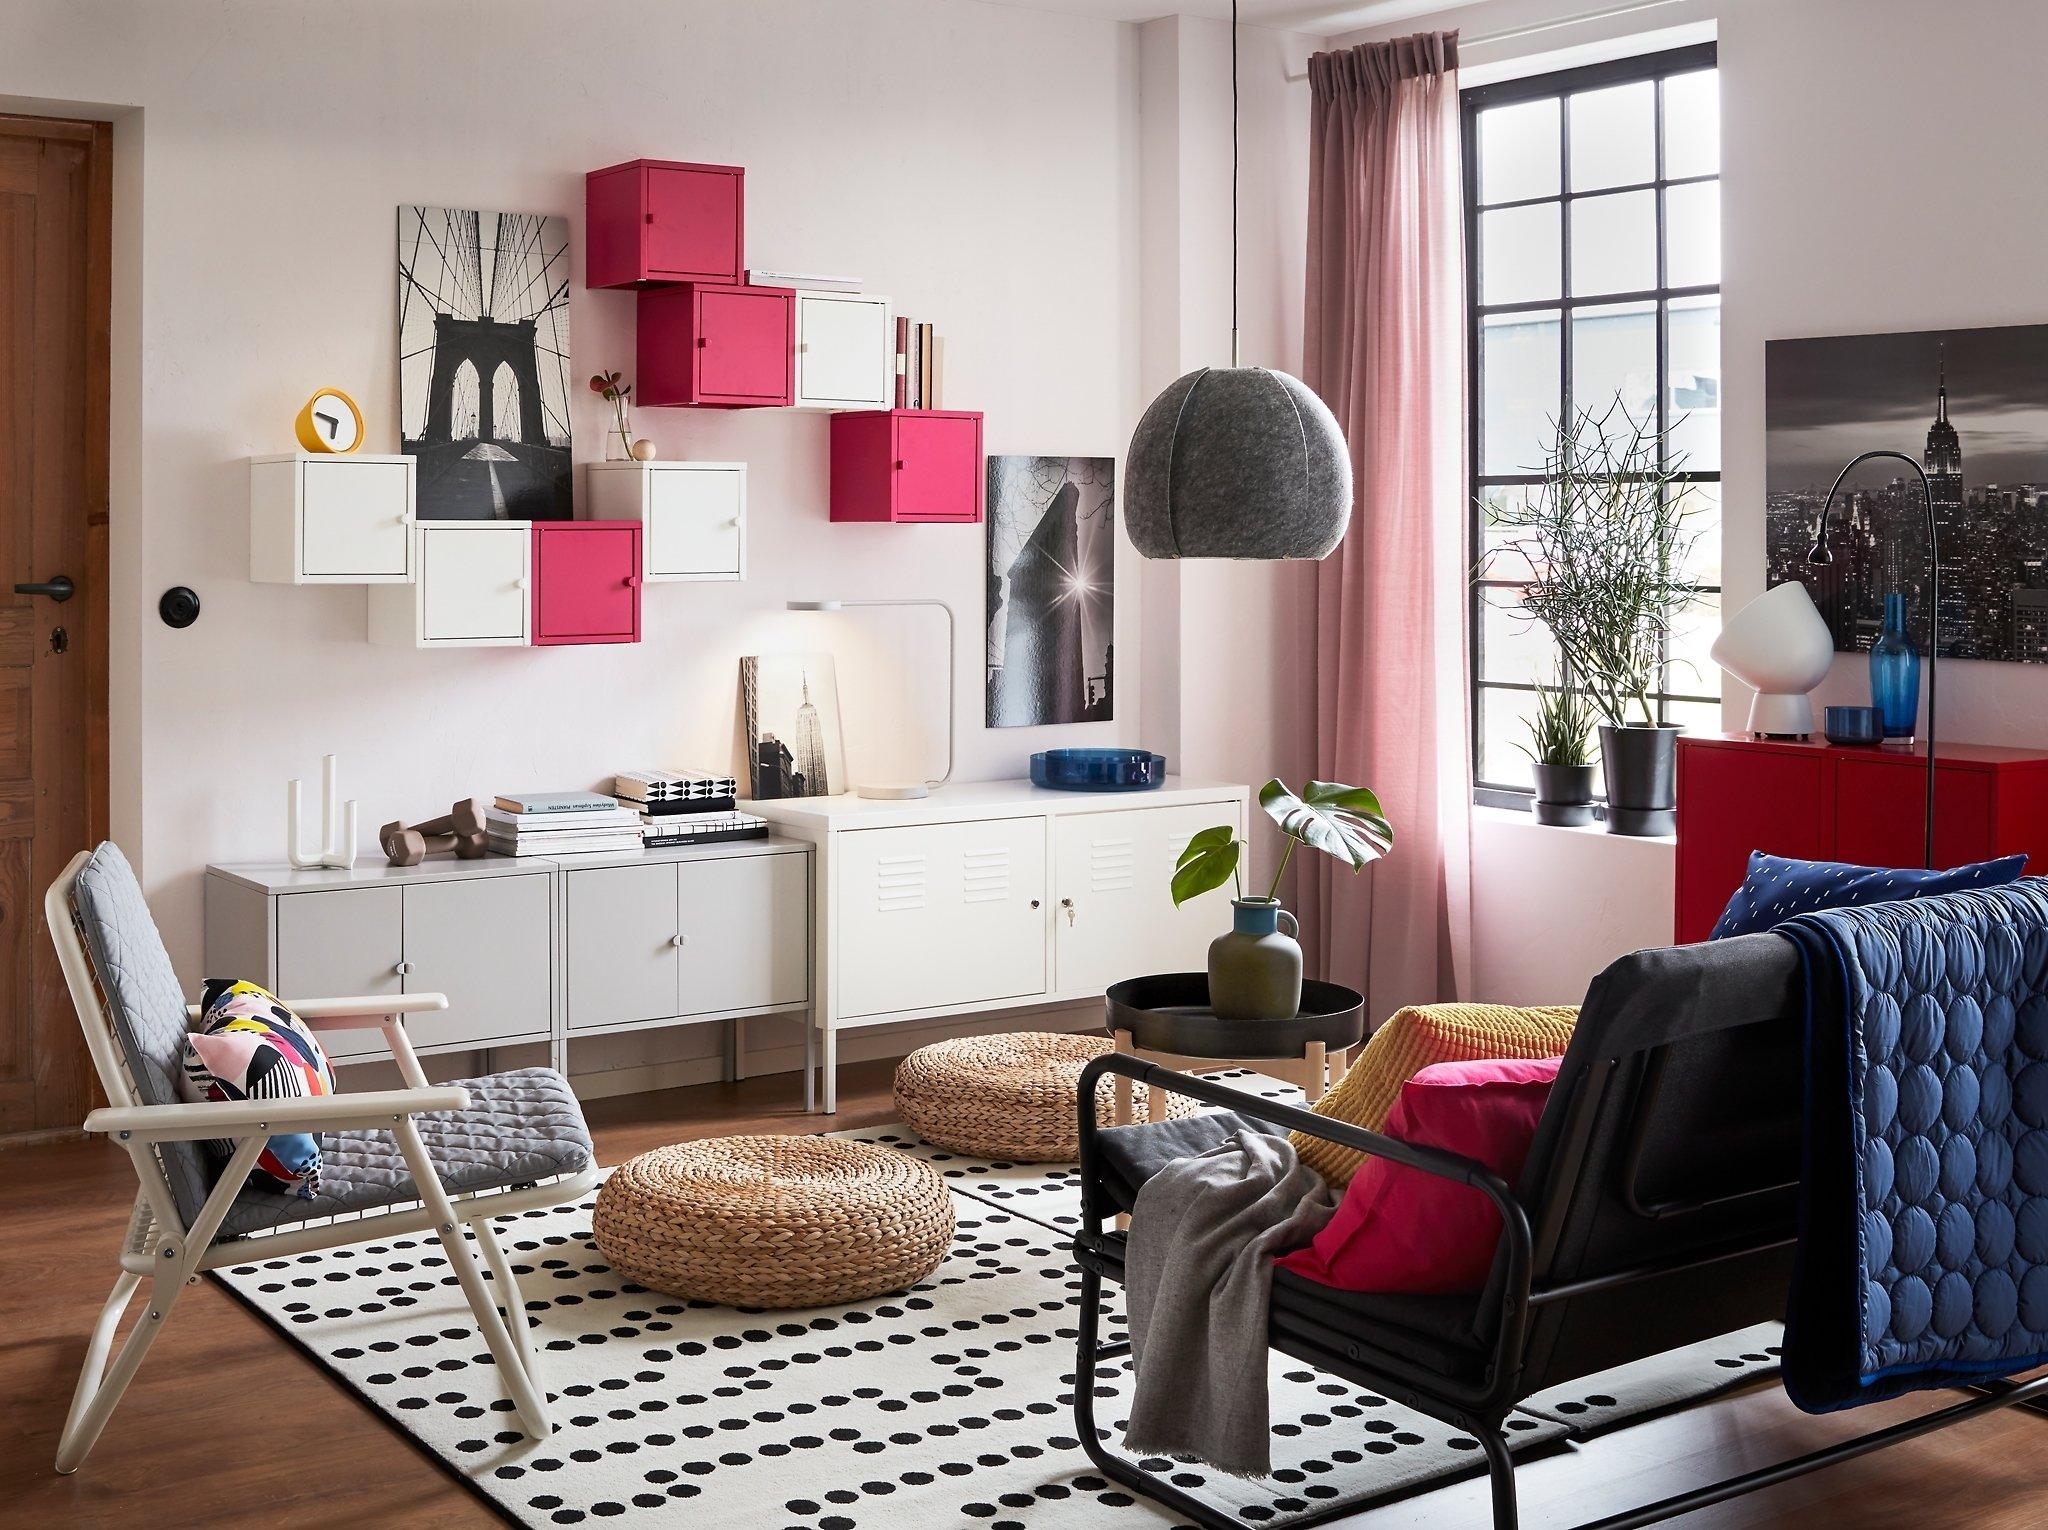 10 Elegant Living Room Furniture Decorating Ideas front room colors decorating on a budget living room living room